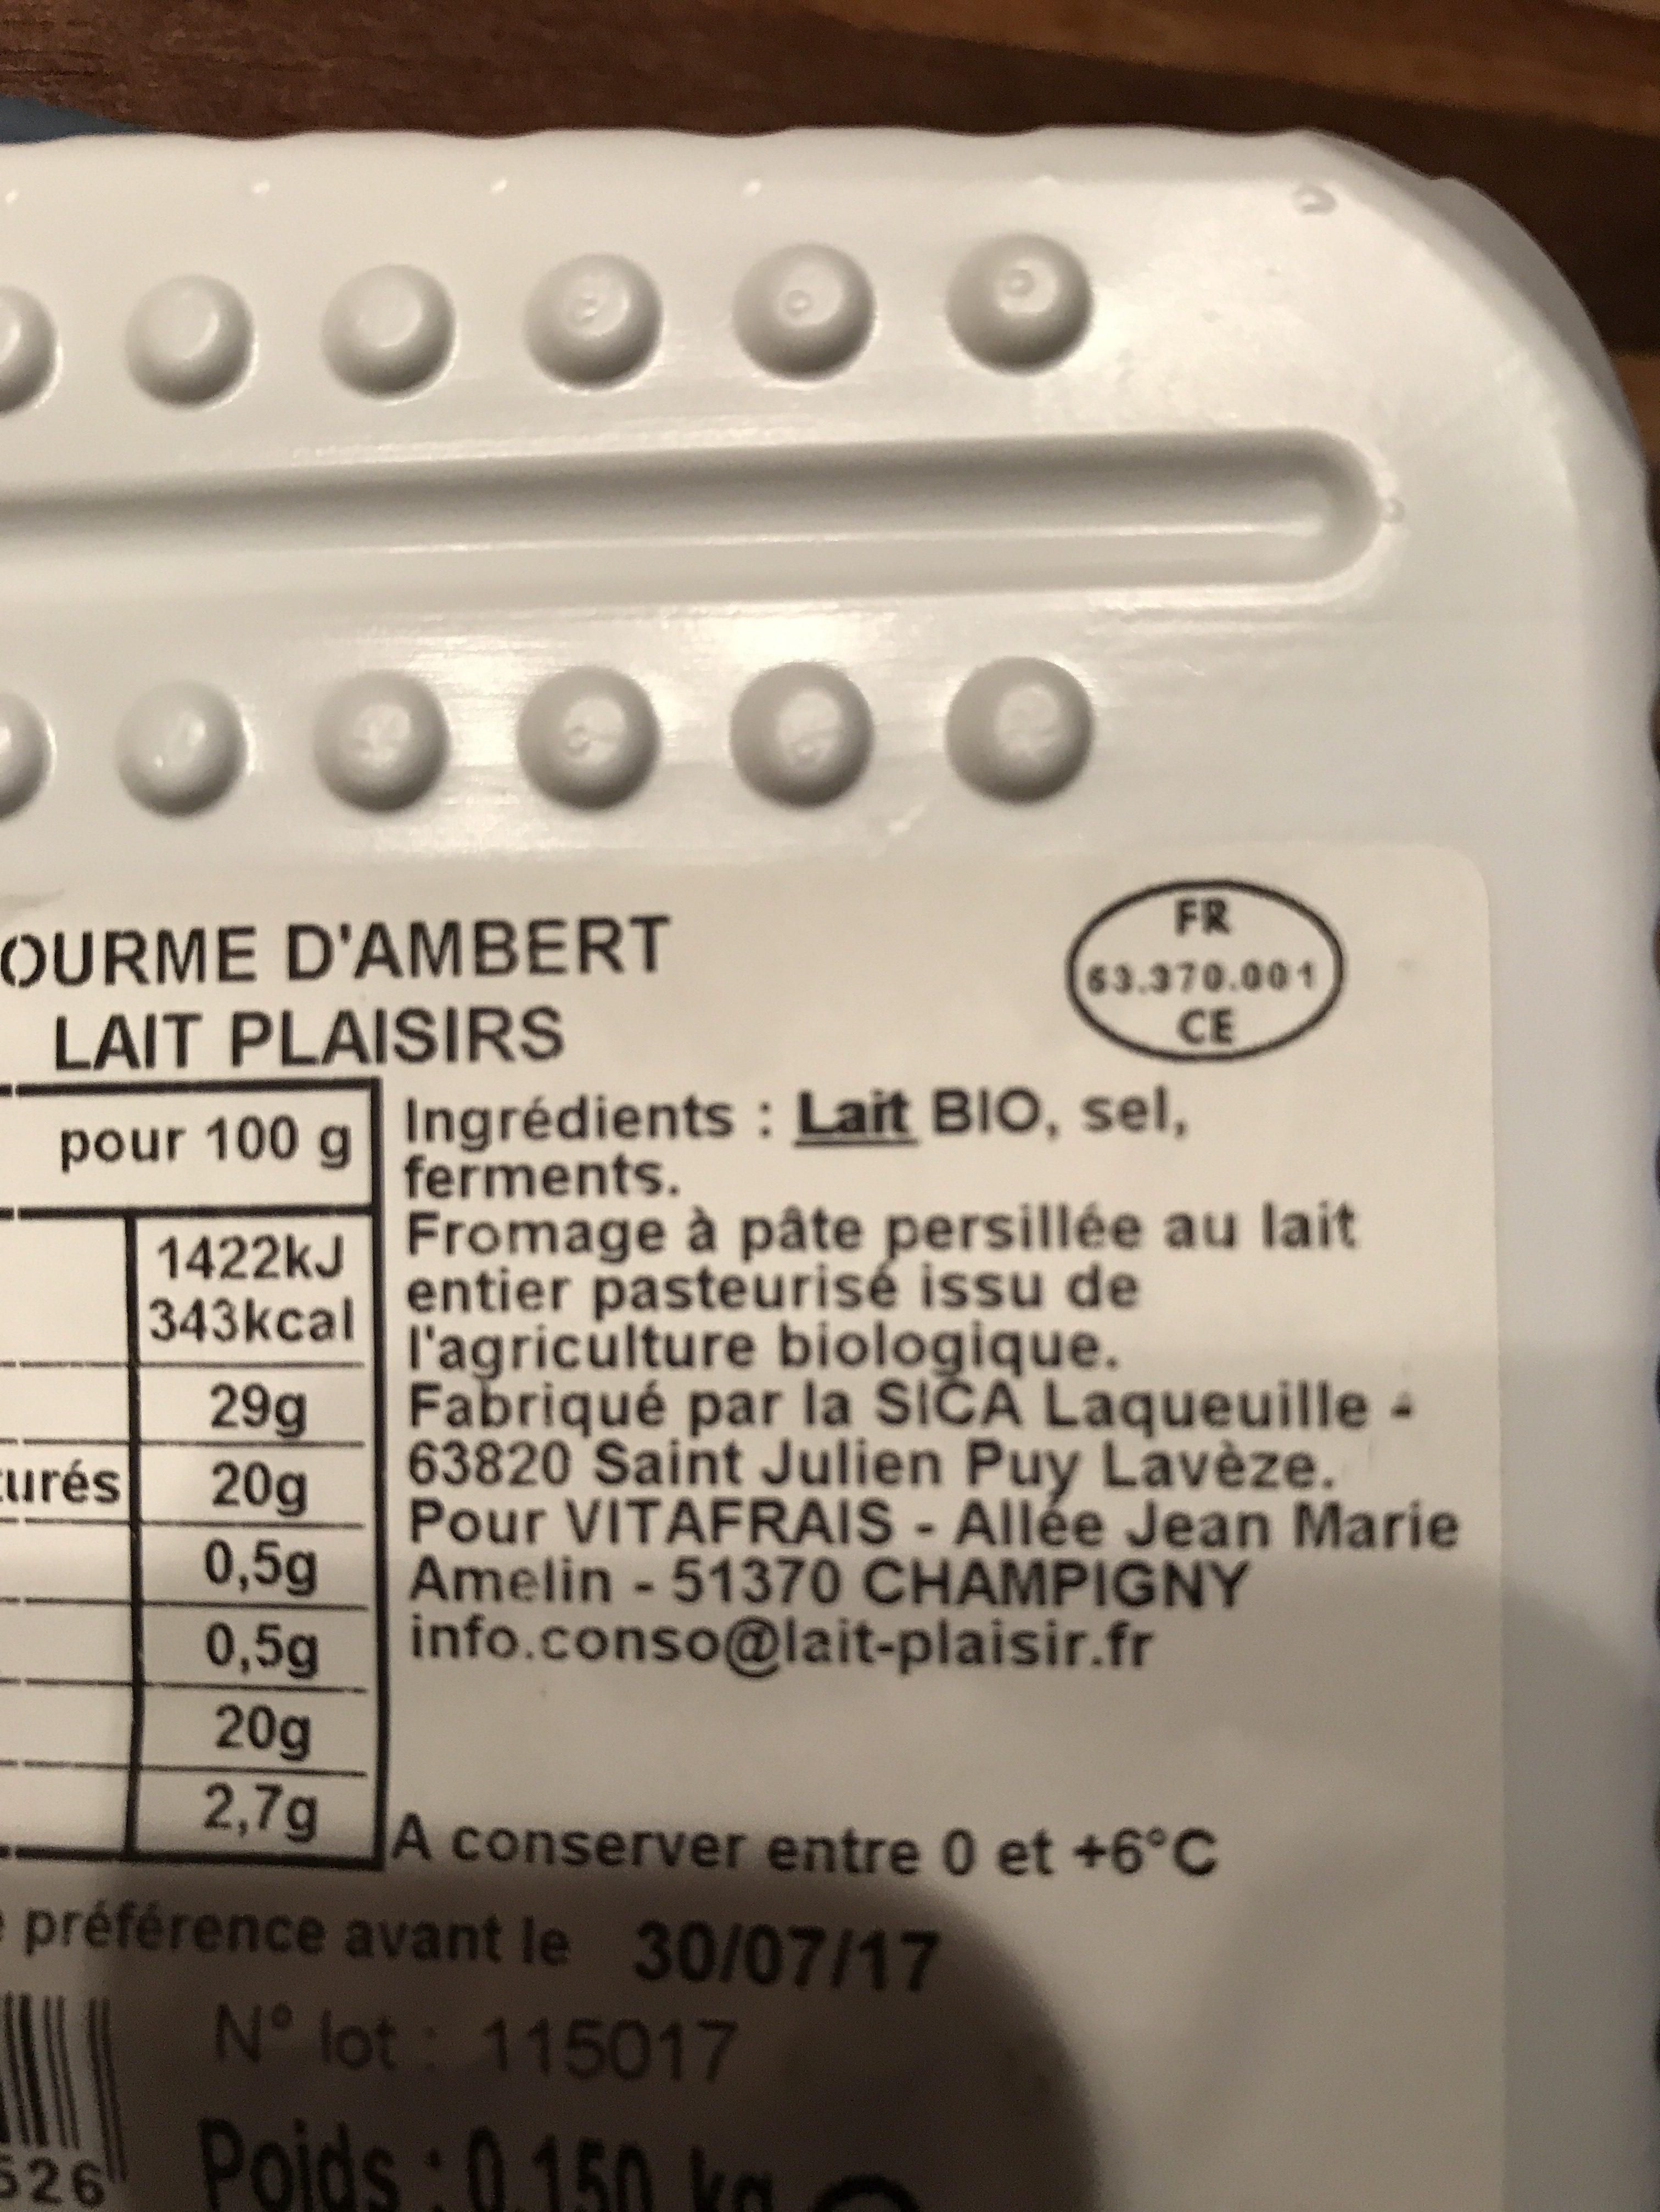 Fourme d'Ambert - Ingredients - fr